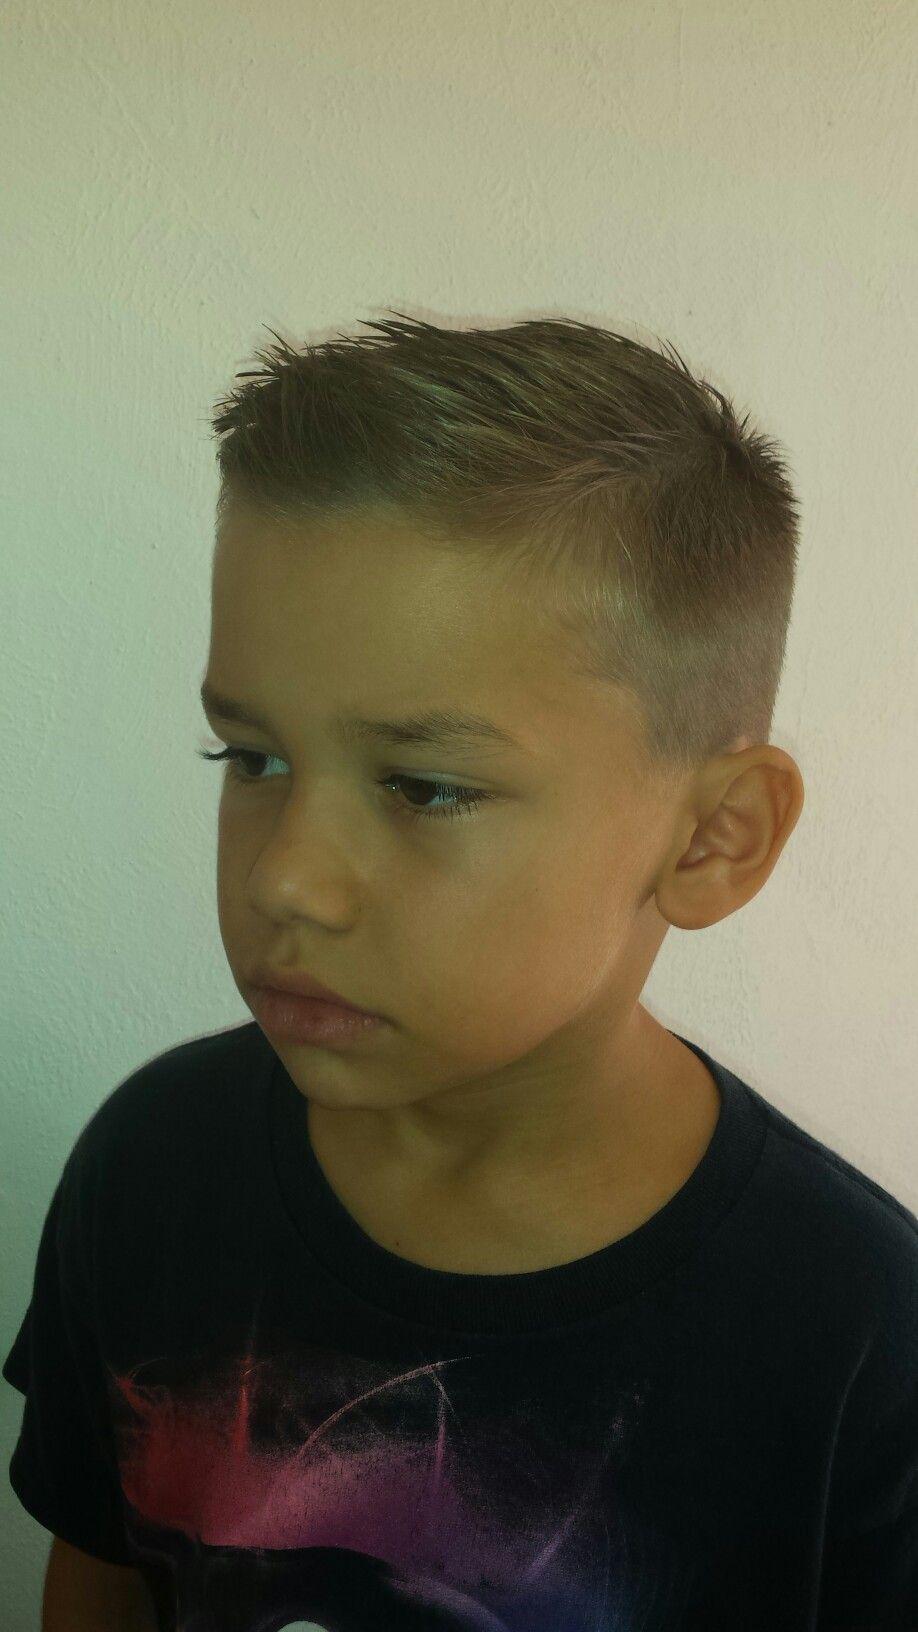 Hairstyles for short hair boys pinterest boy haircuts short